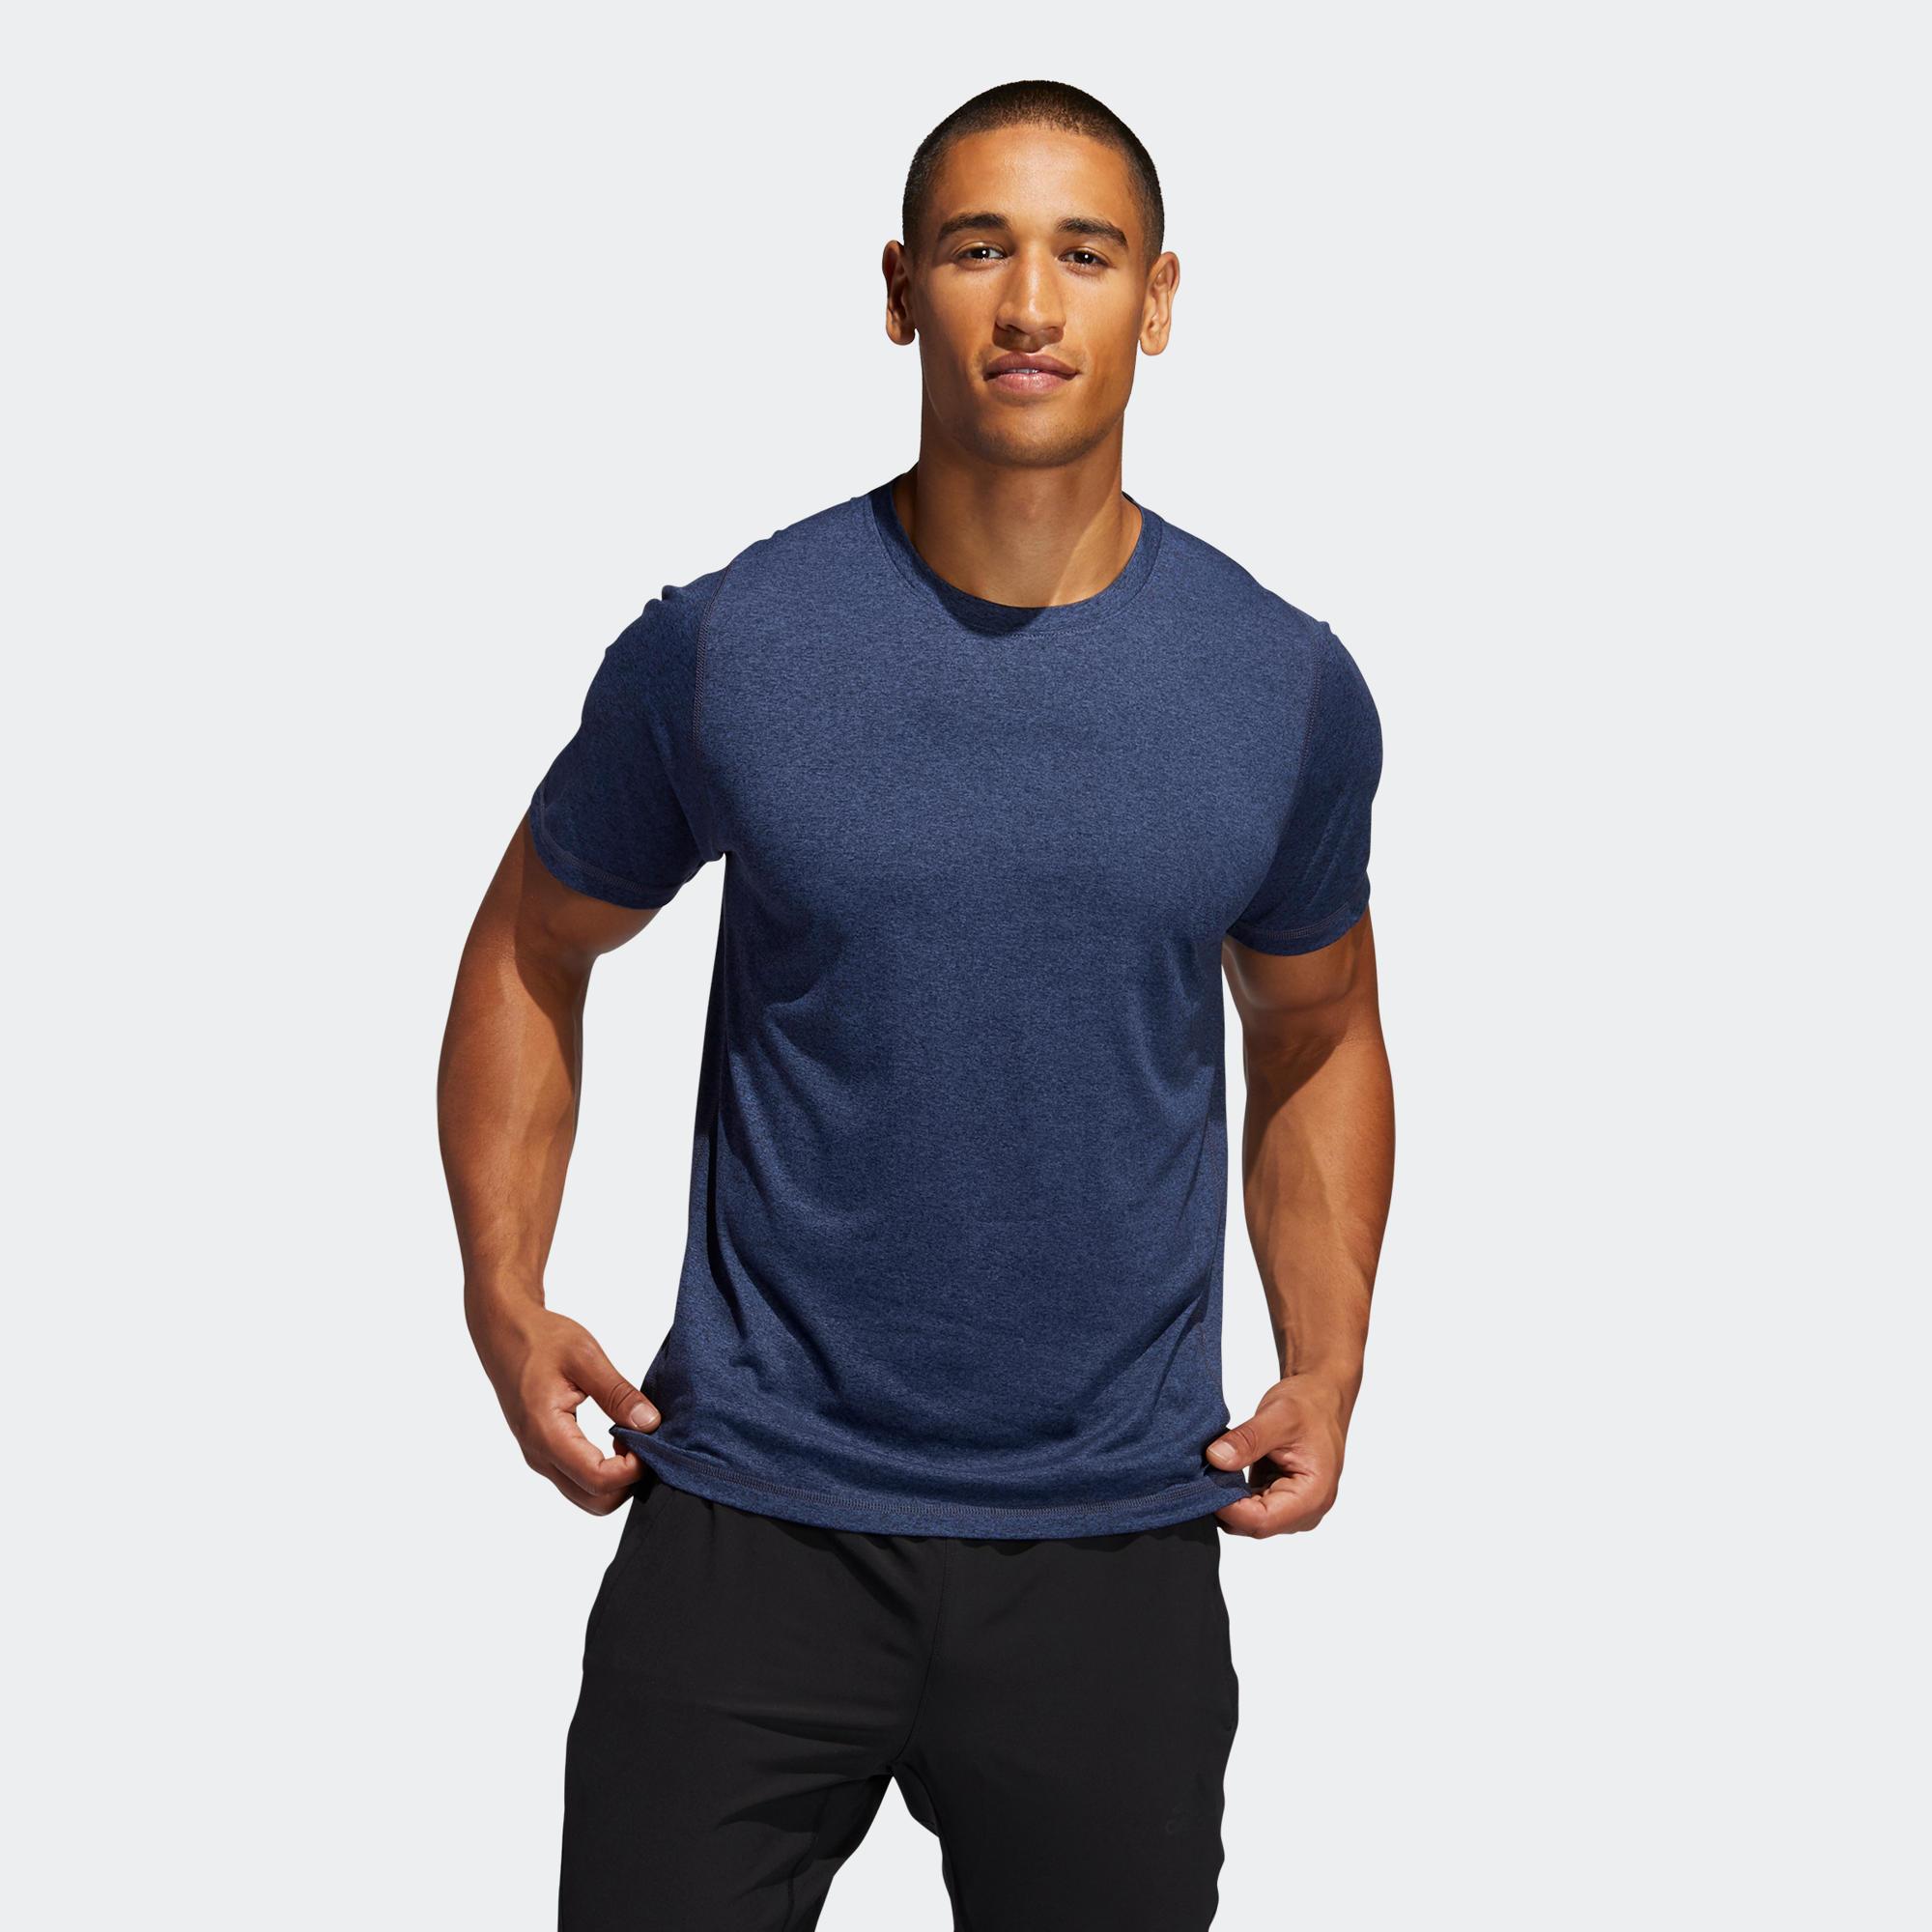 mejor calidad fábrica incomparable Camiseta manga corta Adidas Hombre Gym Fitness azul jaspeado ...